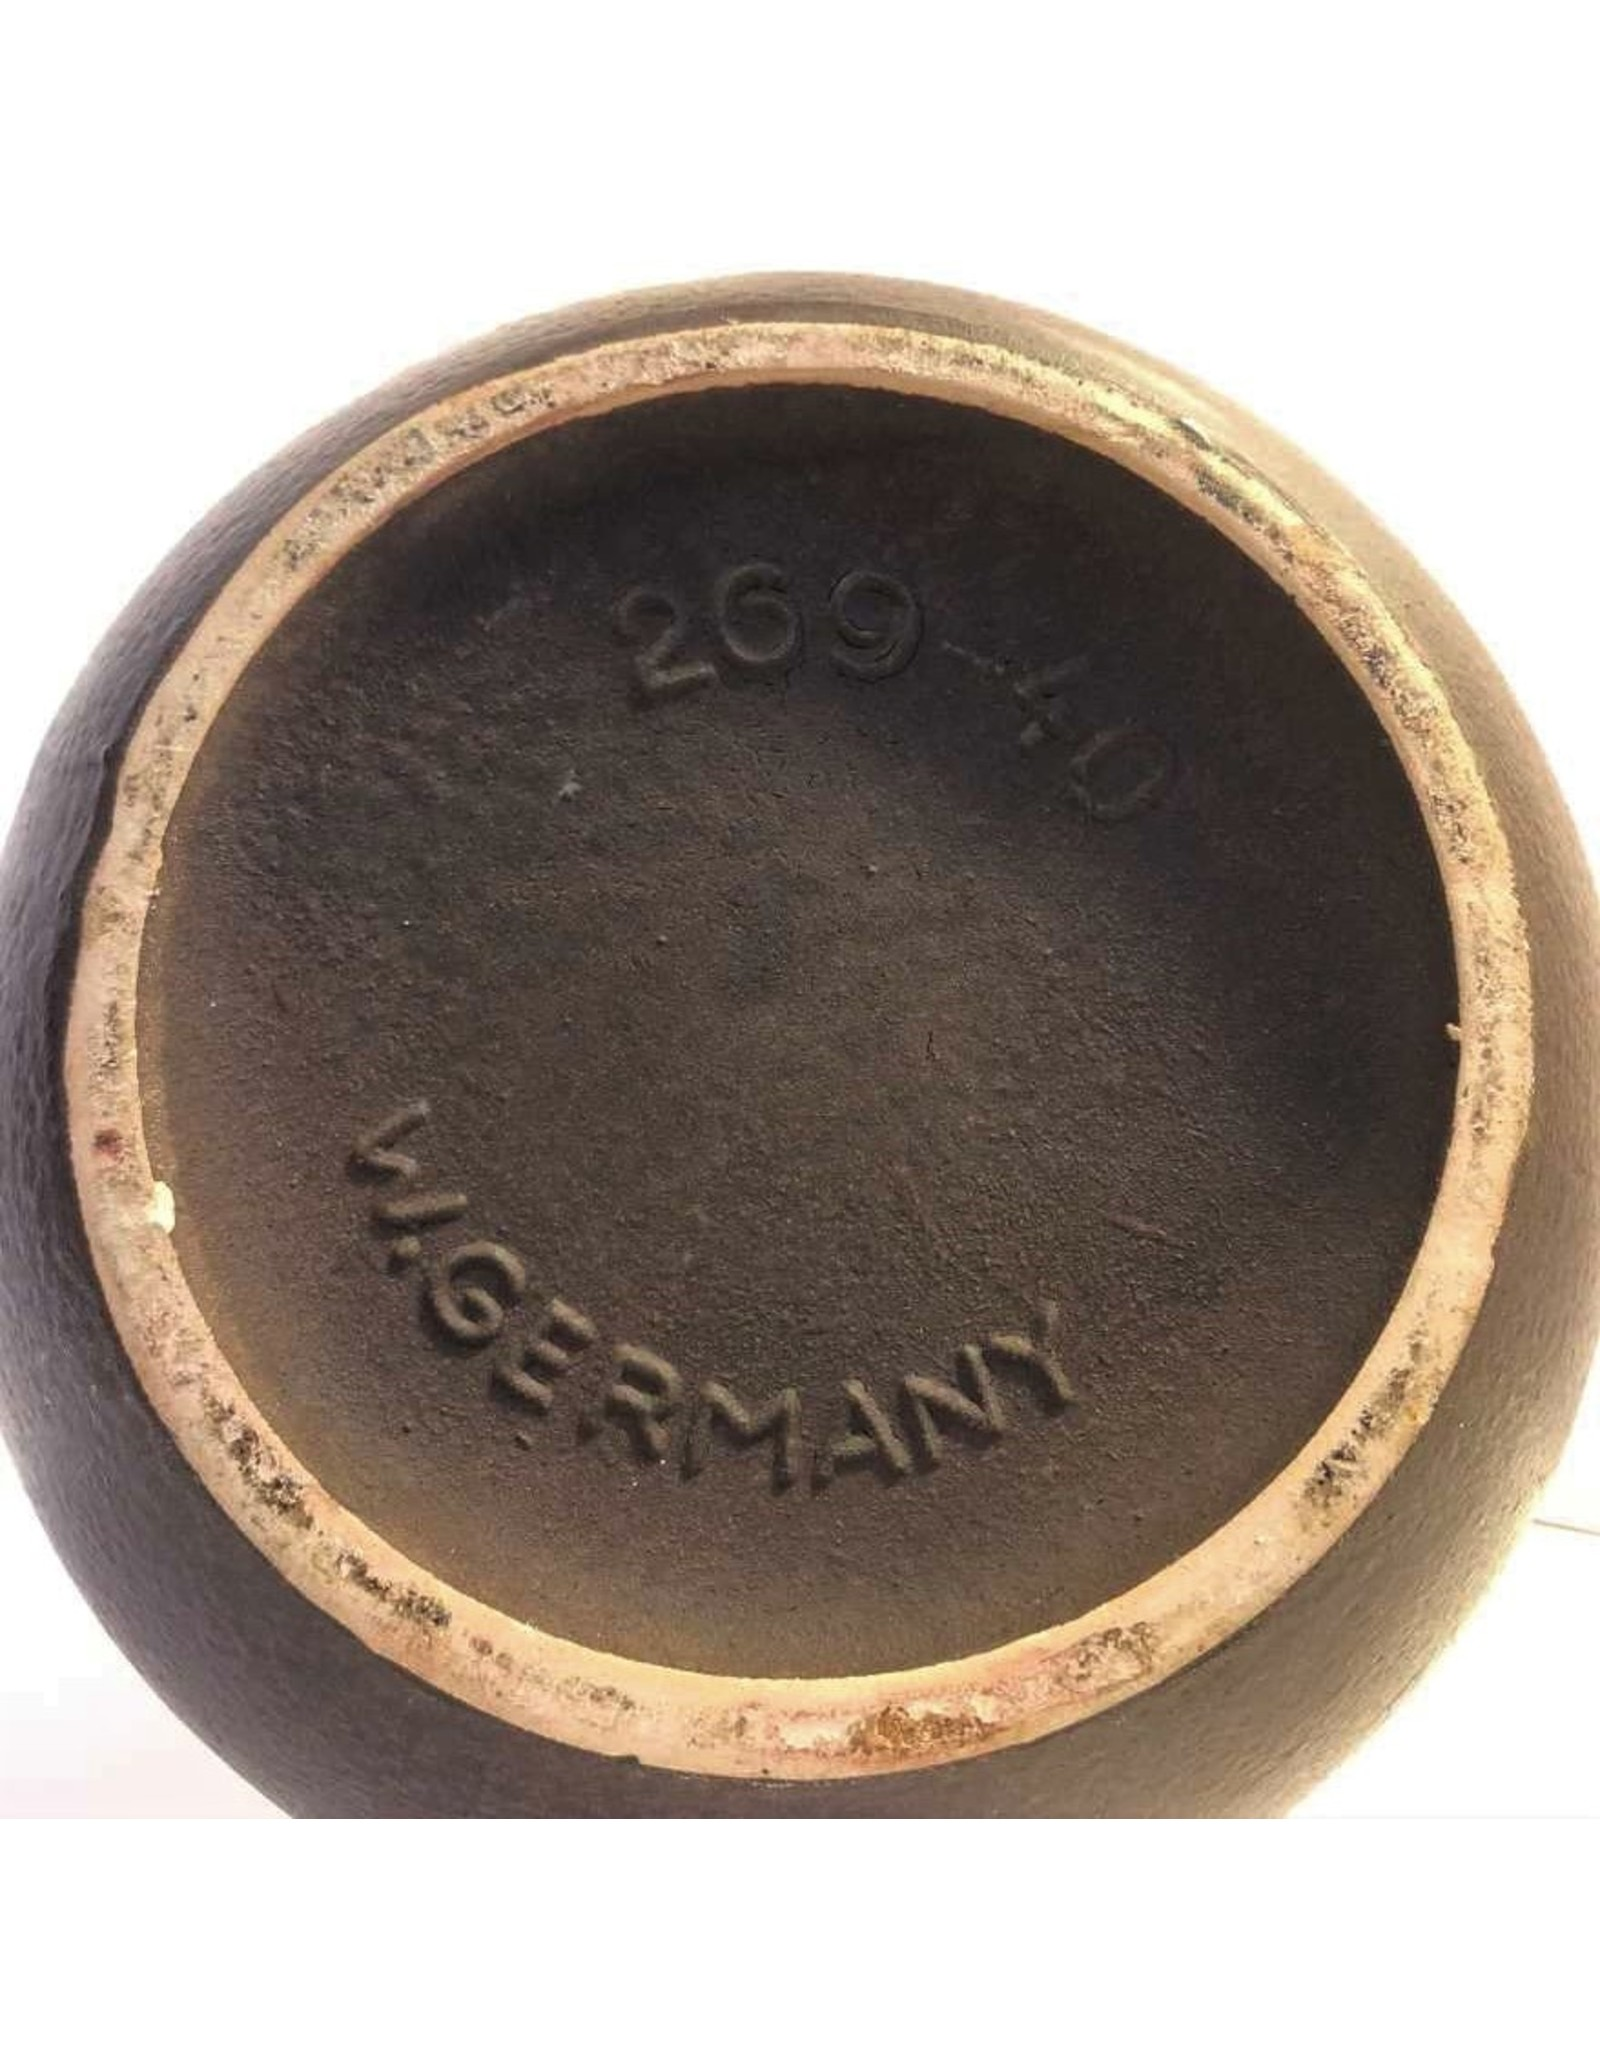 Vase - floor sizes, Scheurich, West German, 269-40, brown and cream